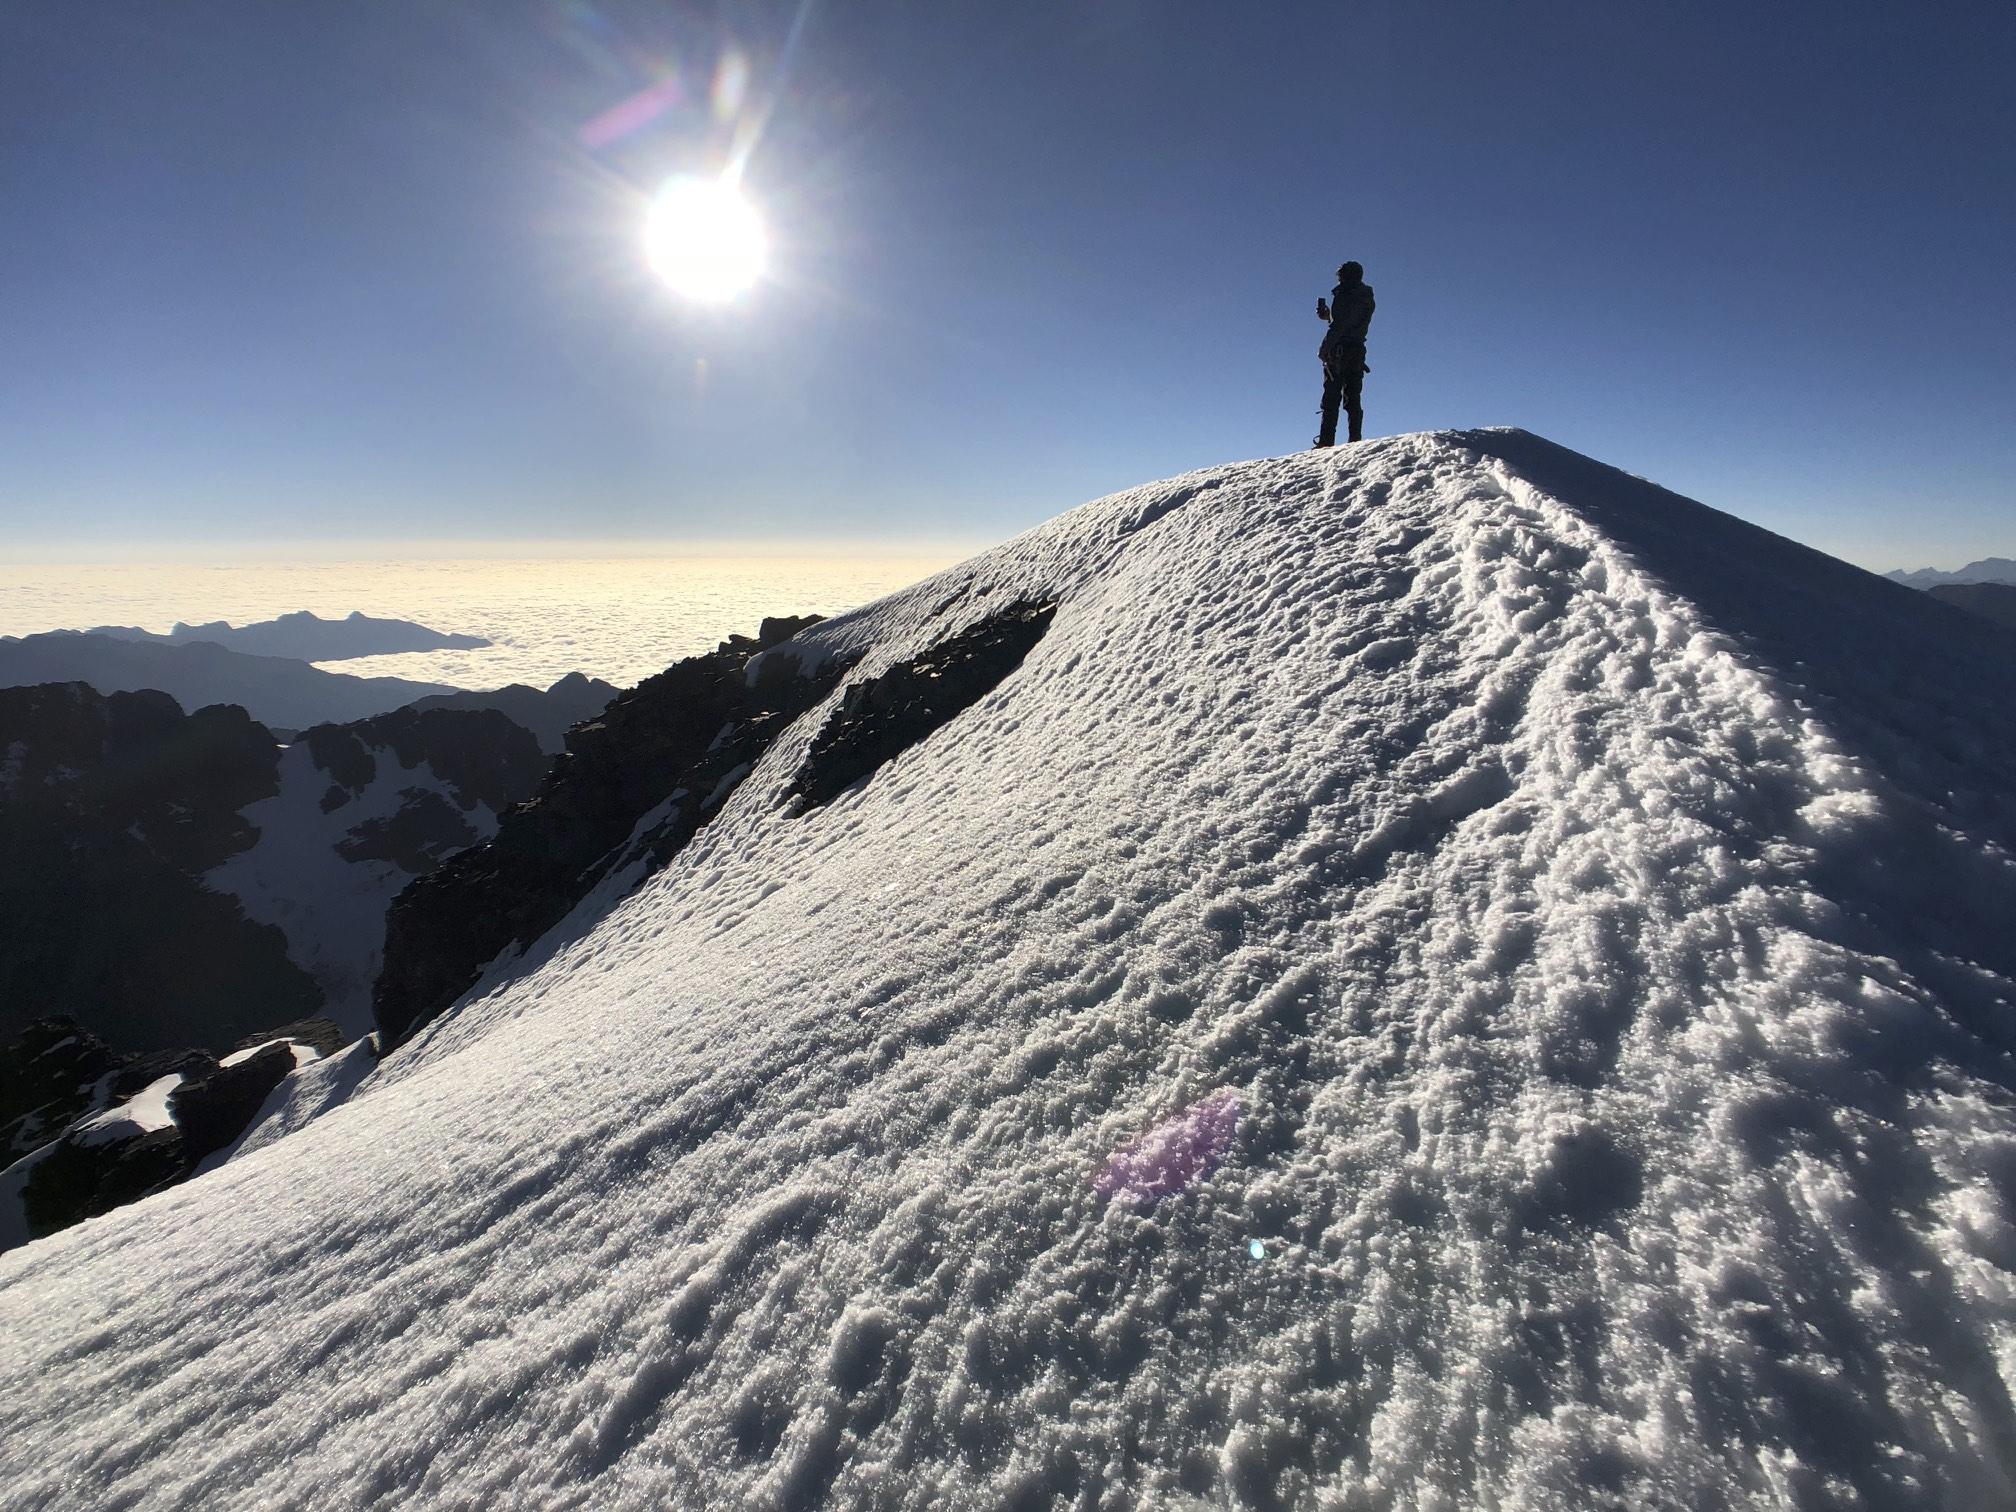 The summit of Pequeno Alpamayo